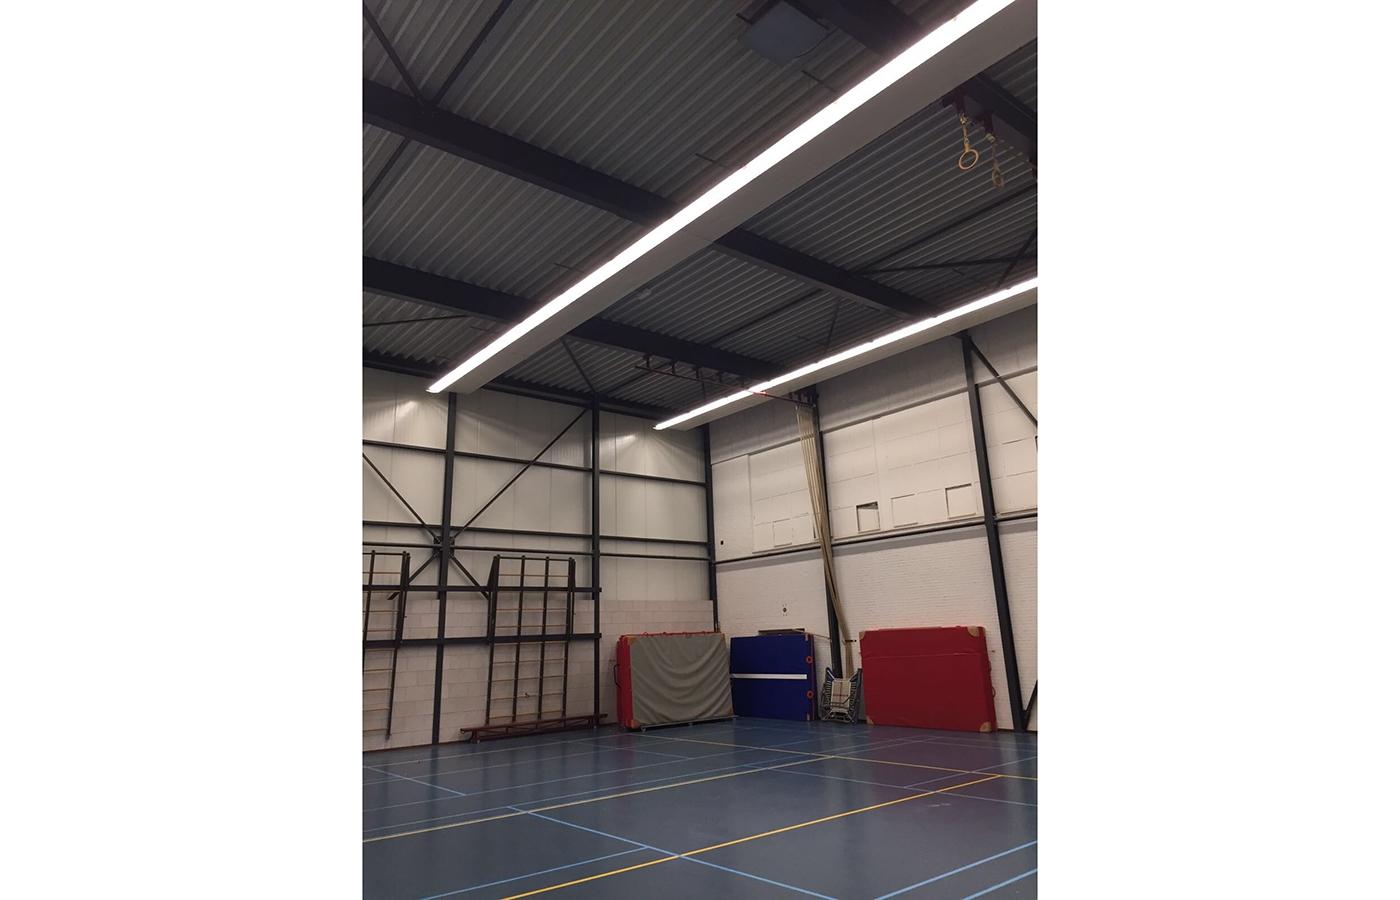 LEDSign project: Lindobeach